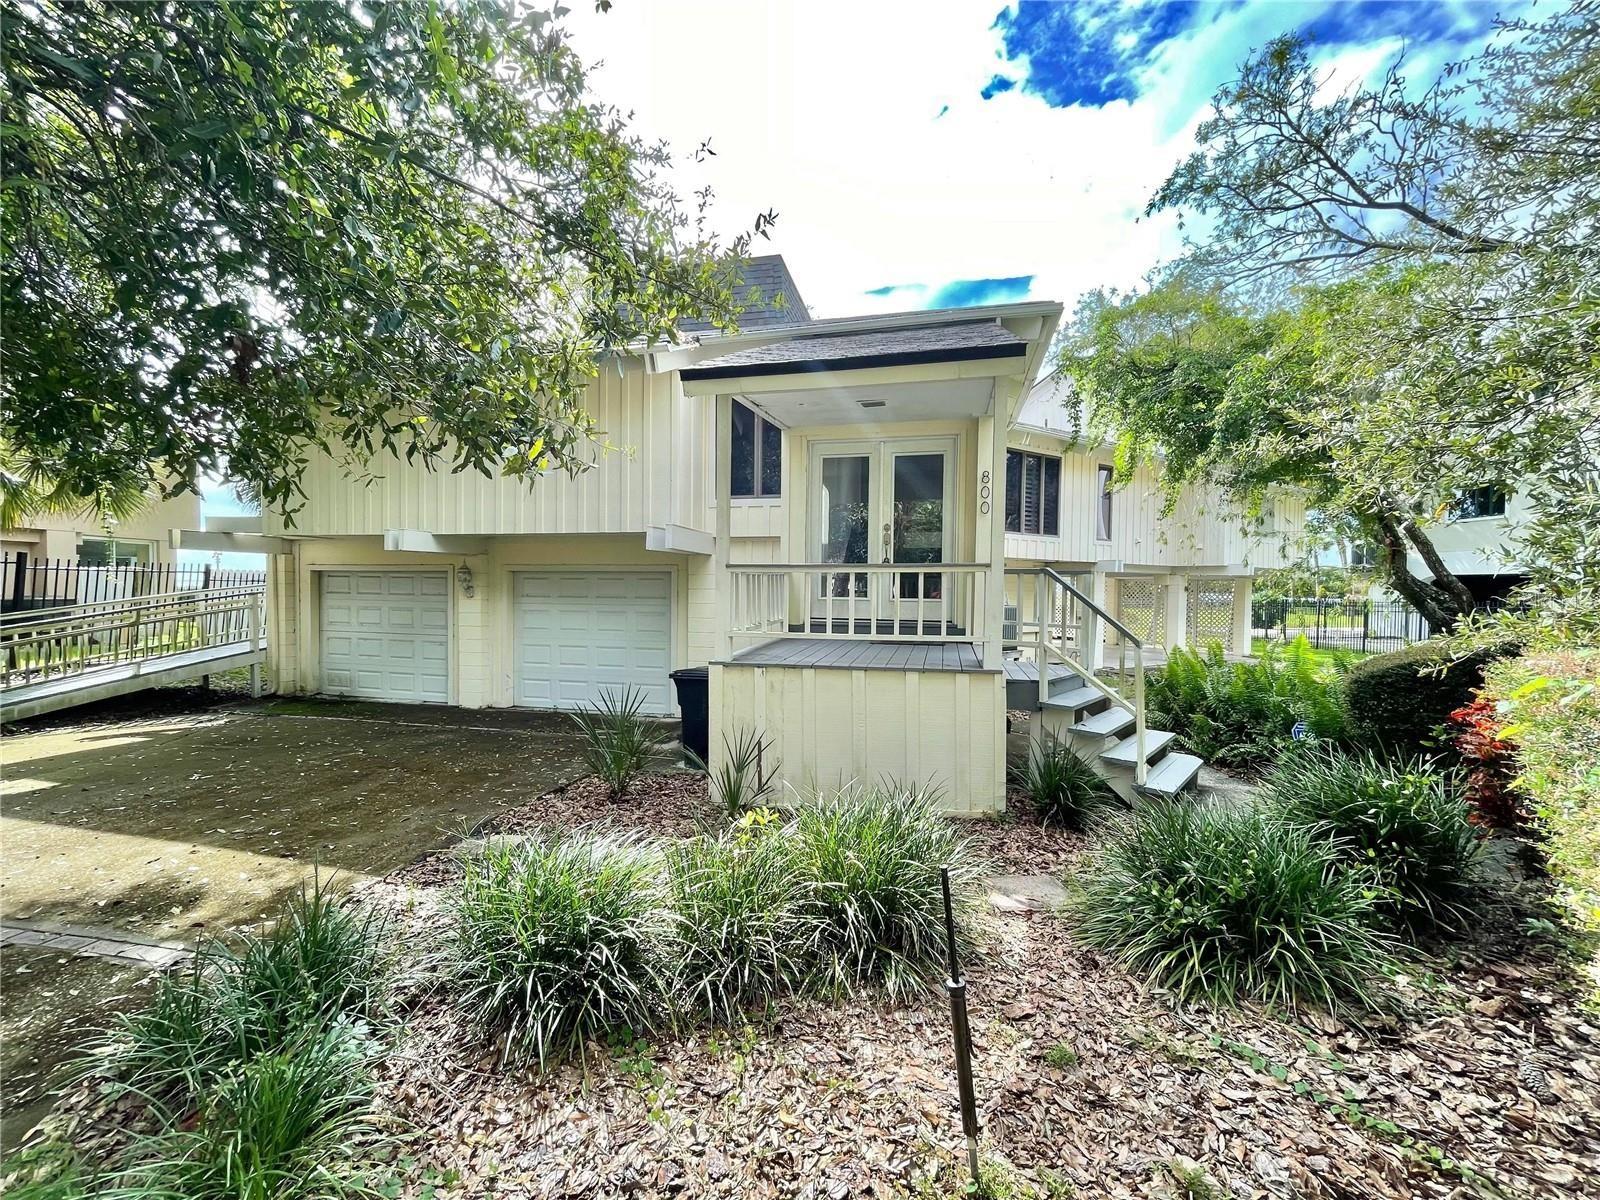 800 S FLORIDA AVENUE, Tarpon Springs, FL 34689 - MLS#: U8137257